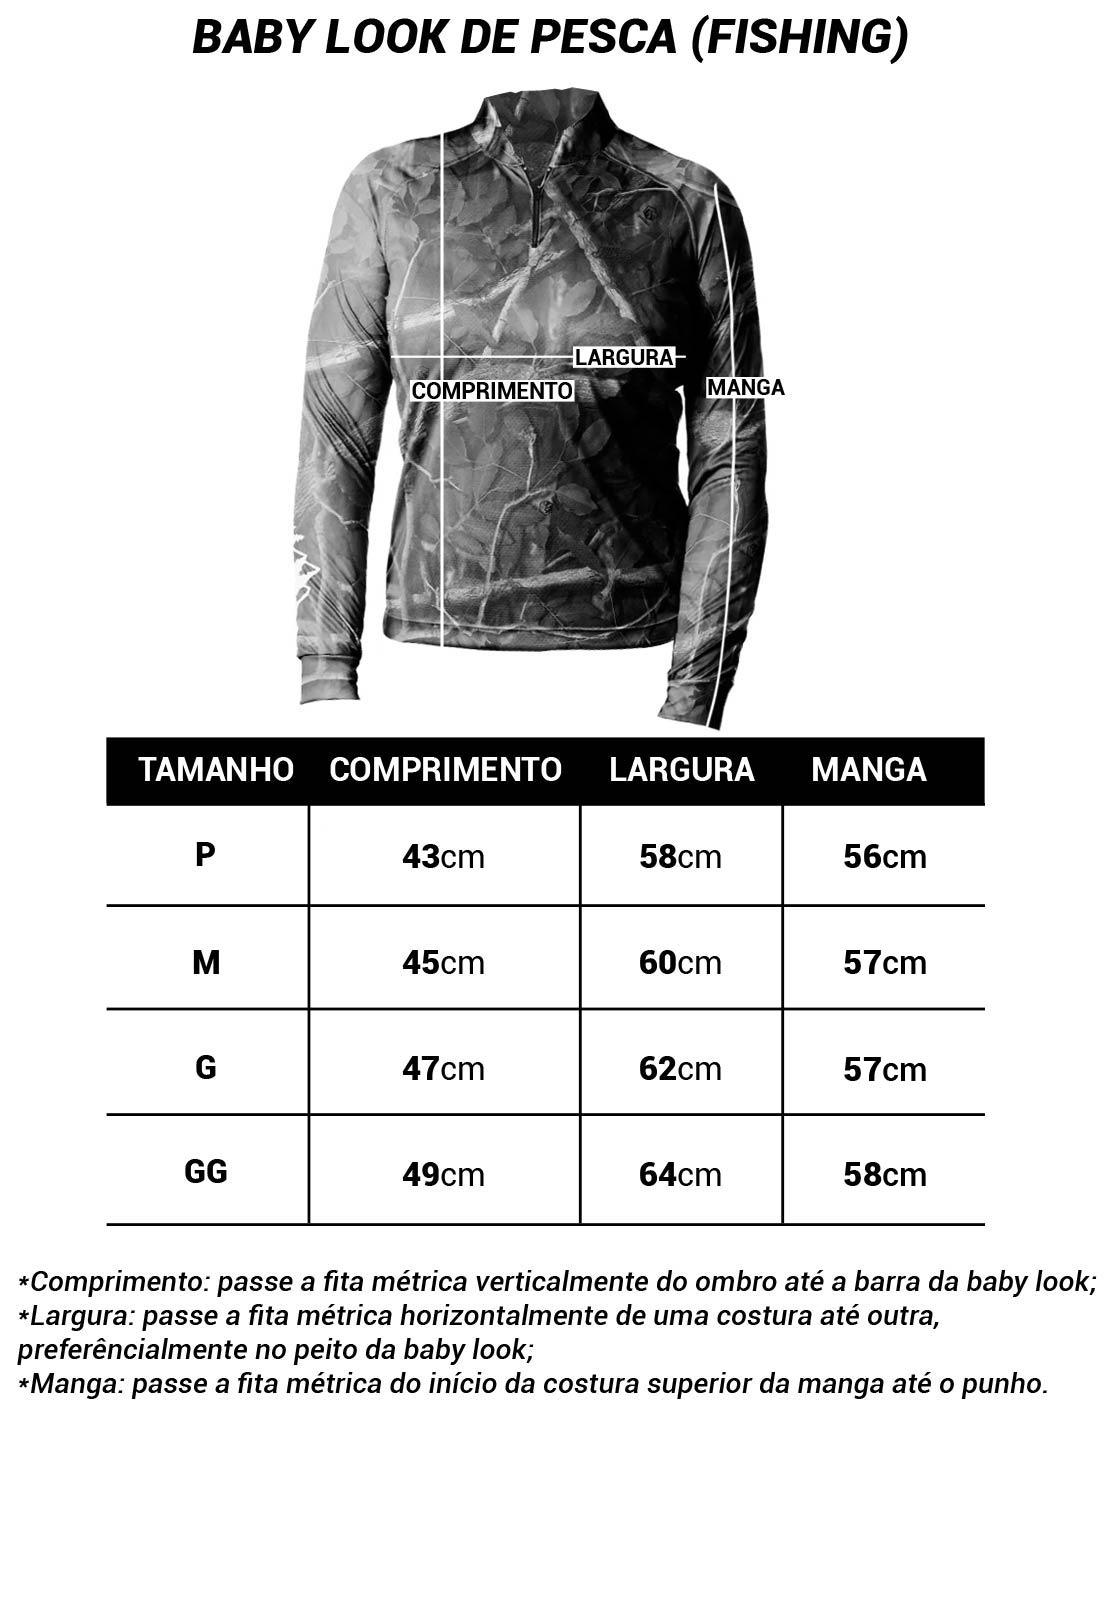 CAMISA DE PESCA FISH TECH PRO 30 FEMININA + BANDANA GRÁTIS  - Real Hunter